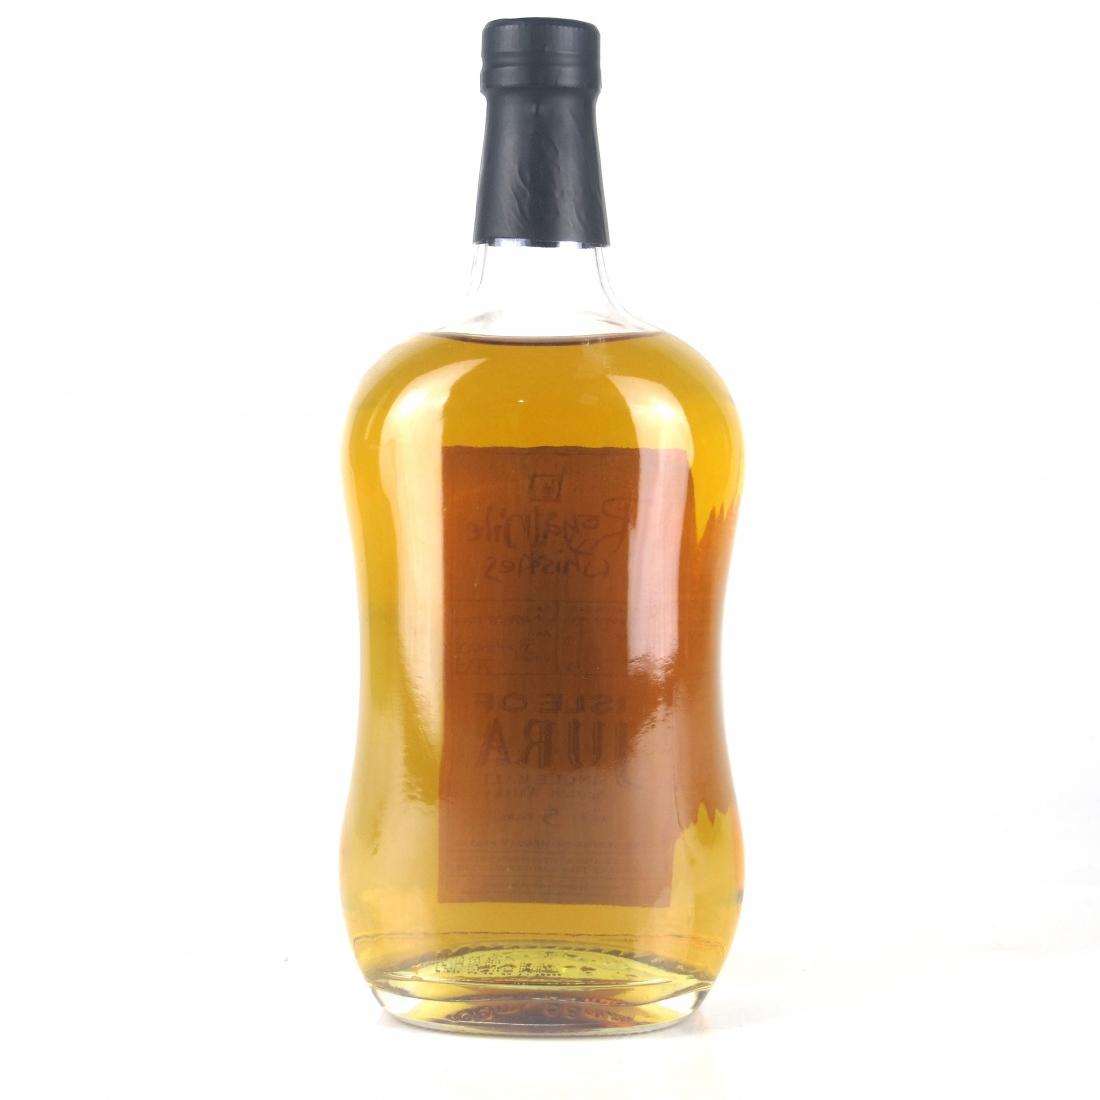 Jura 1999 Royal Mile Whiskies Heavily Peated